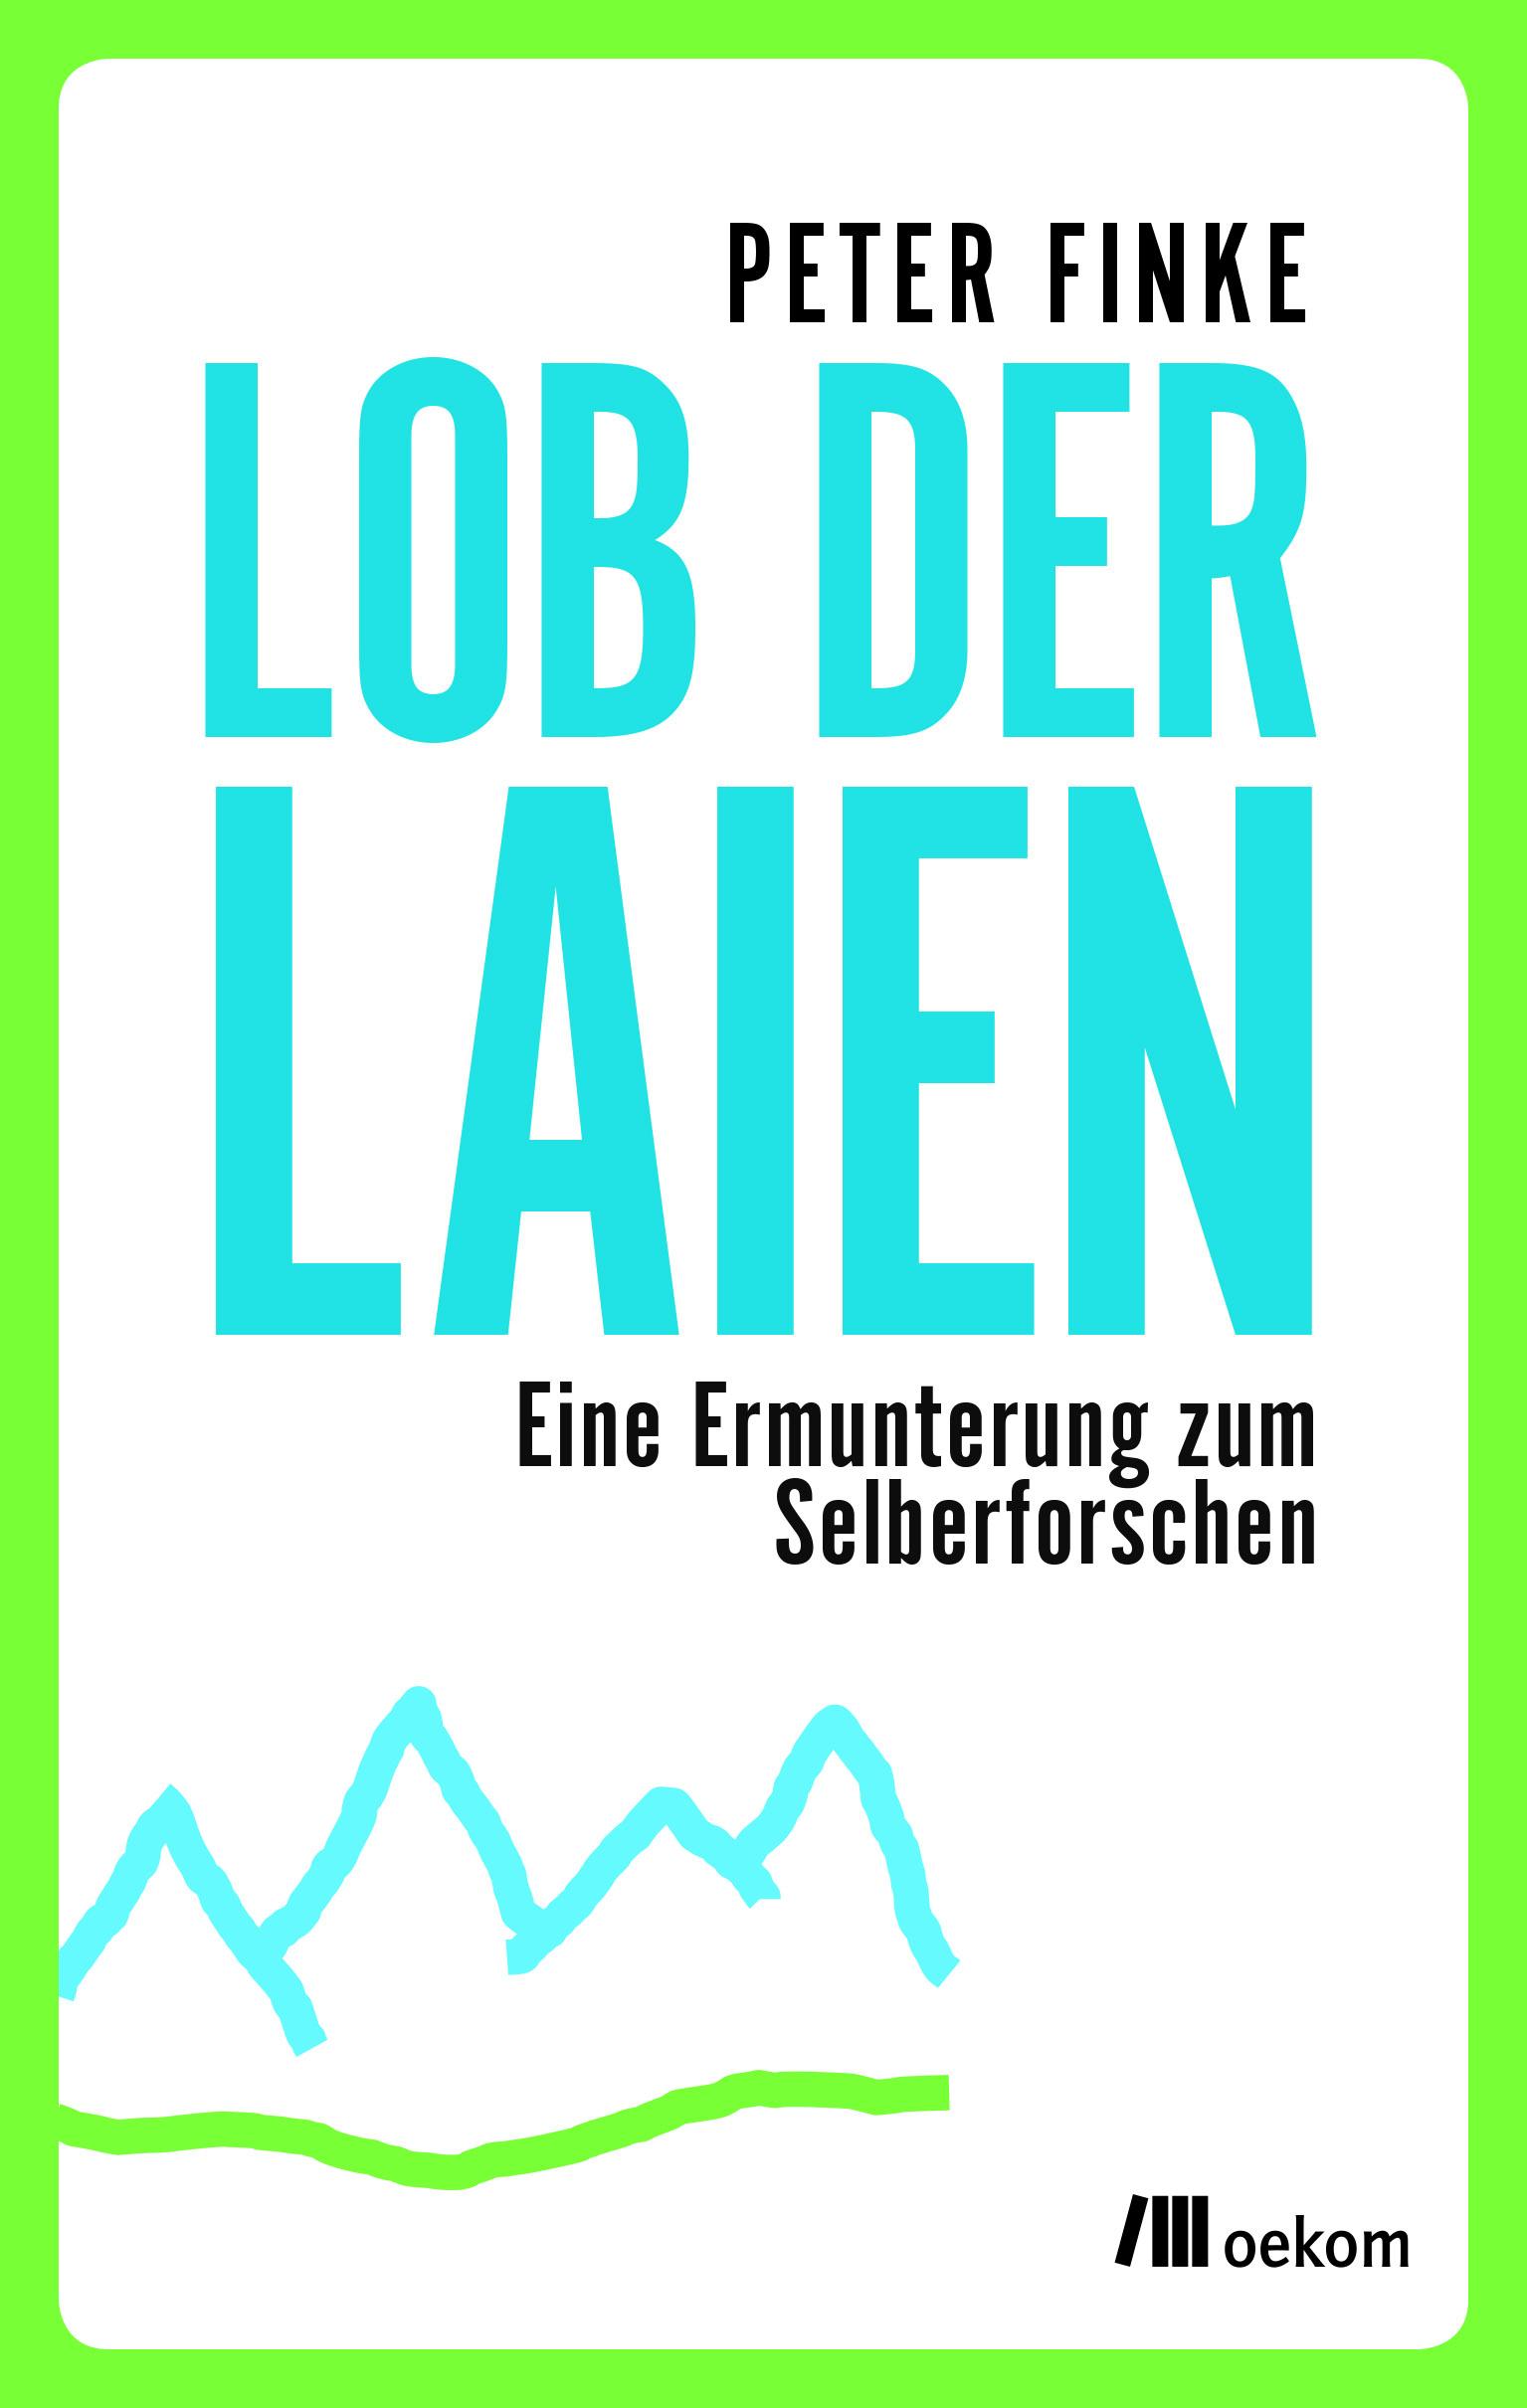 Peter Finke Buchcover von Lob der Laien (Ausschnitt)